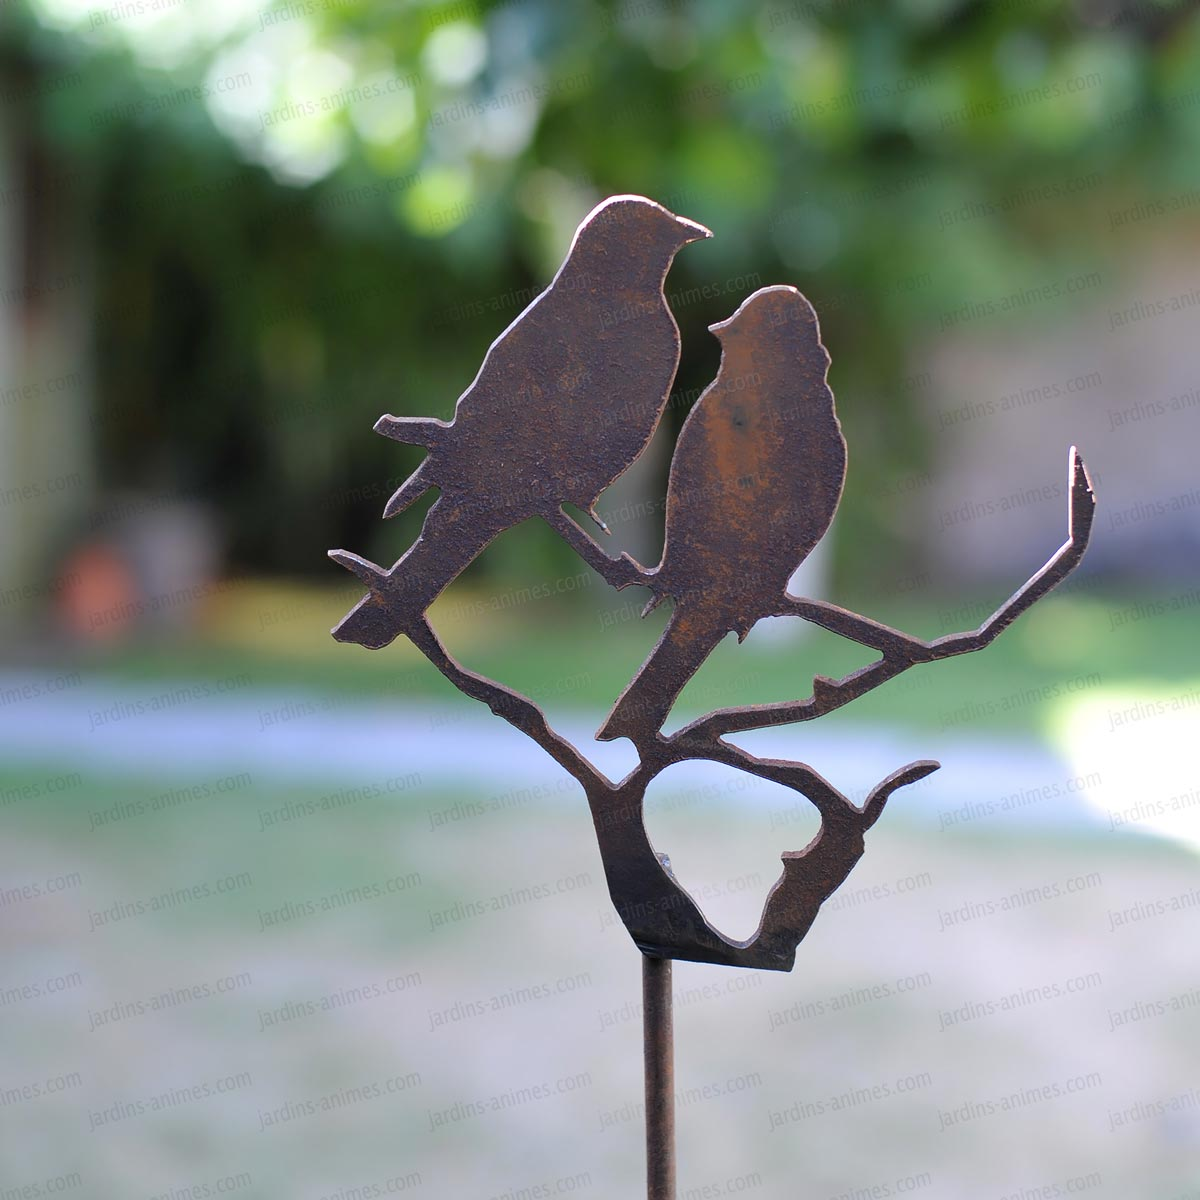 Silhouette oiseaux sur branche d co de jardin en m tal for Objets decoratifs de jardin